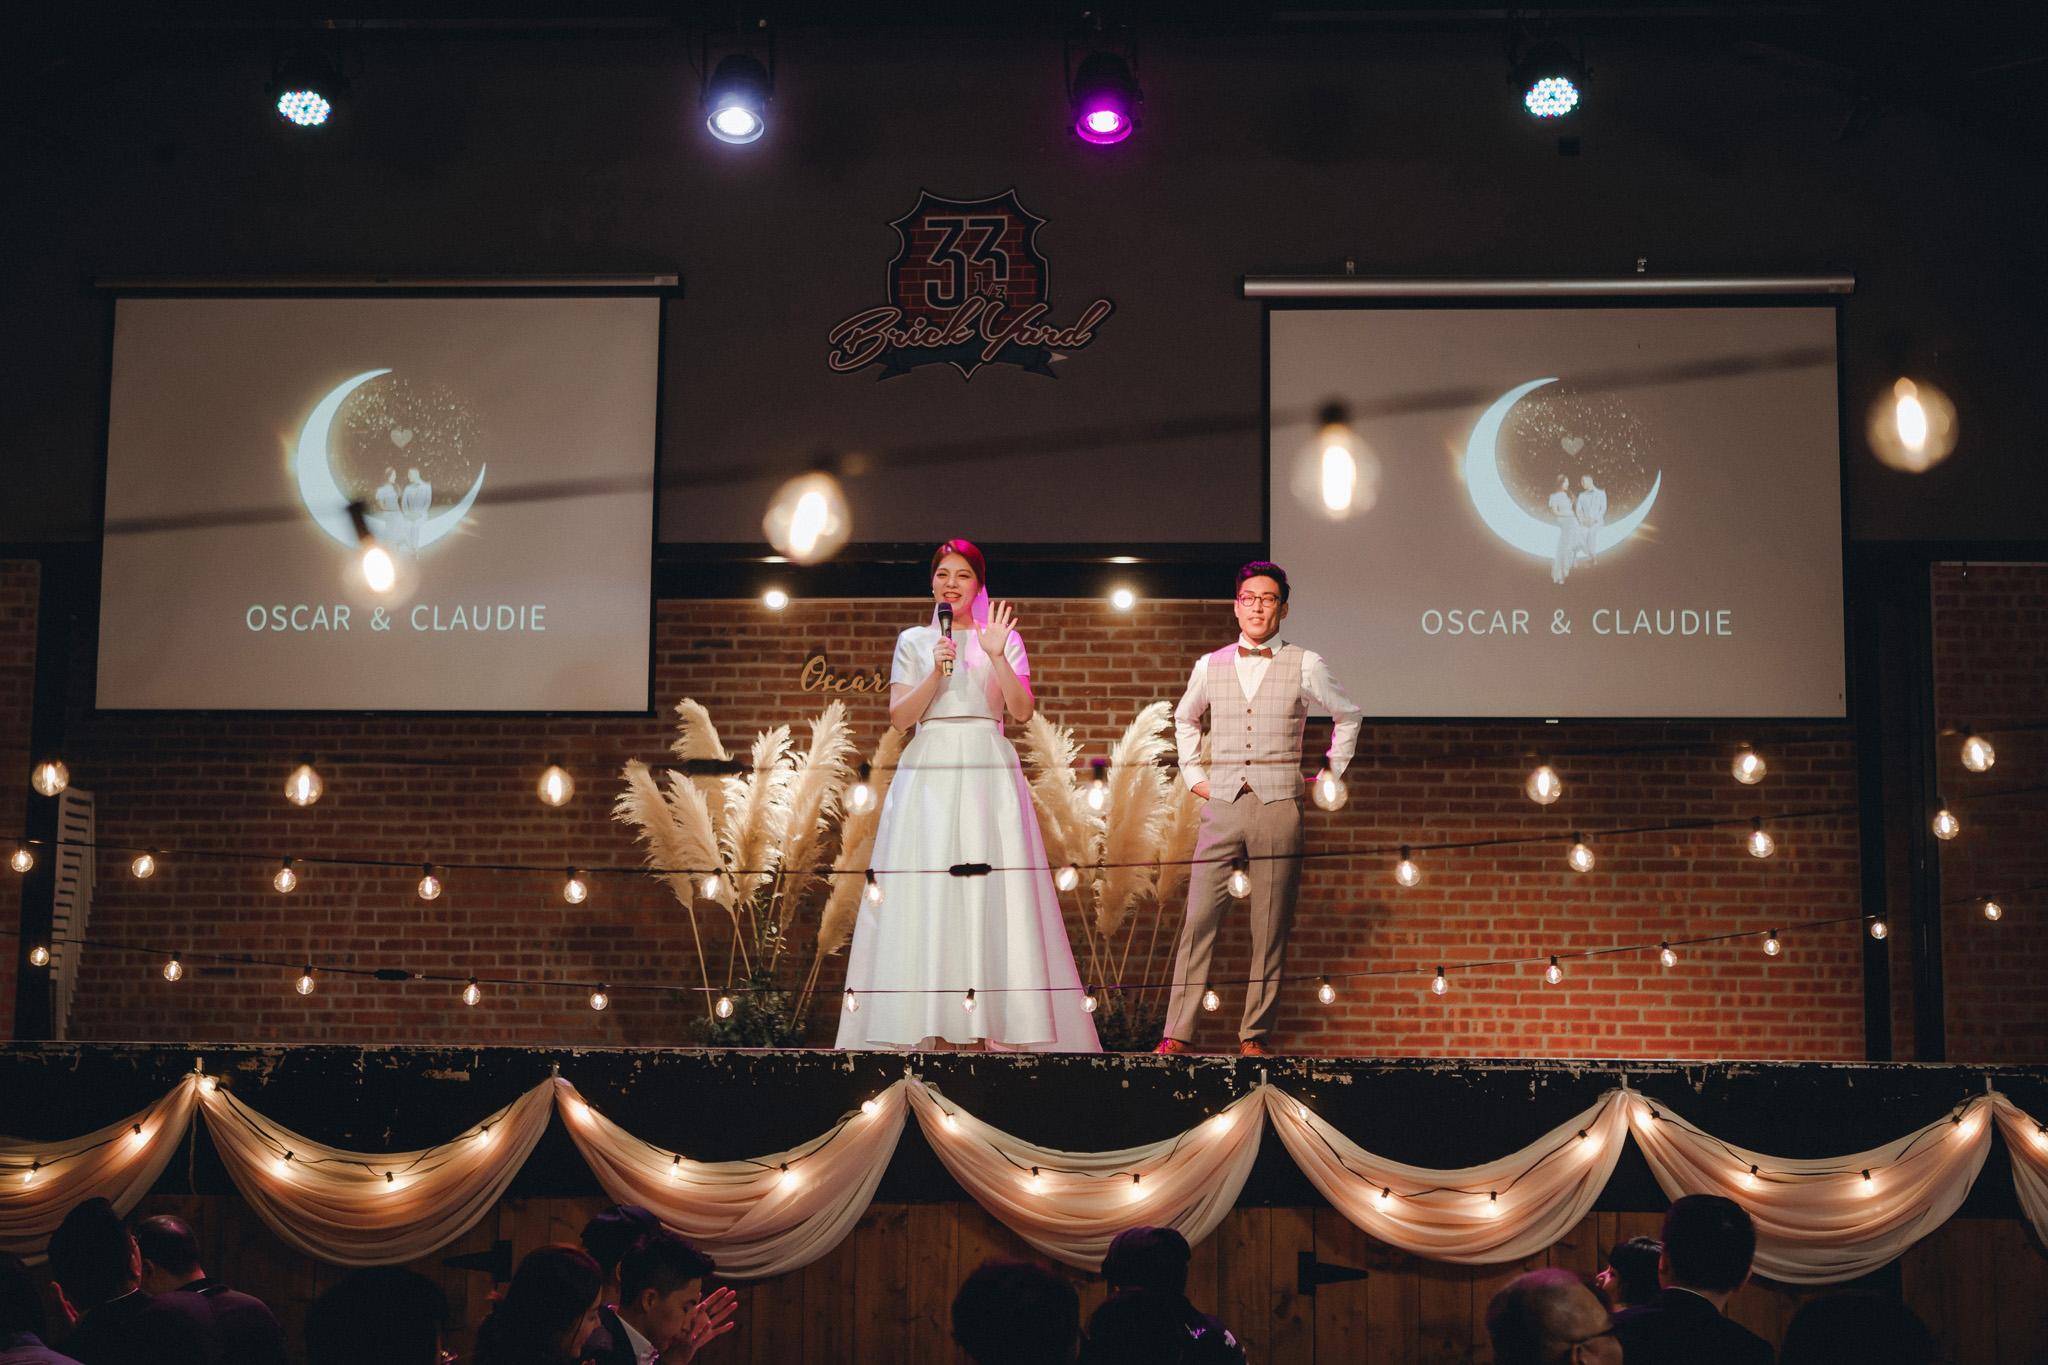 EW 台北婚攝 居米 濟南教會 Brick Yard 33 美軍俱樂部 婚禮 婚宴-76